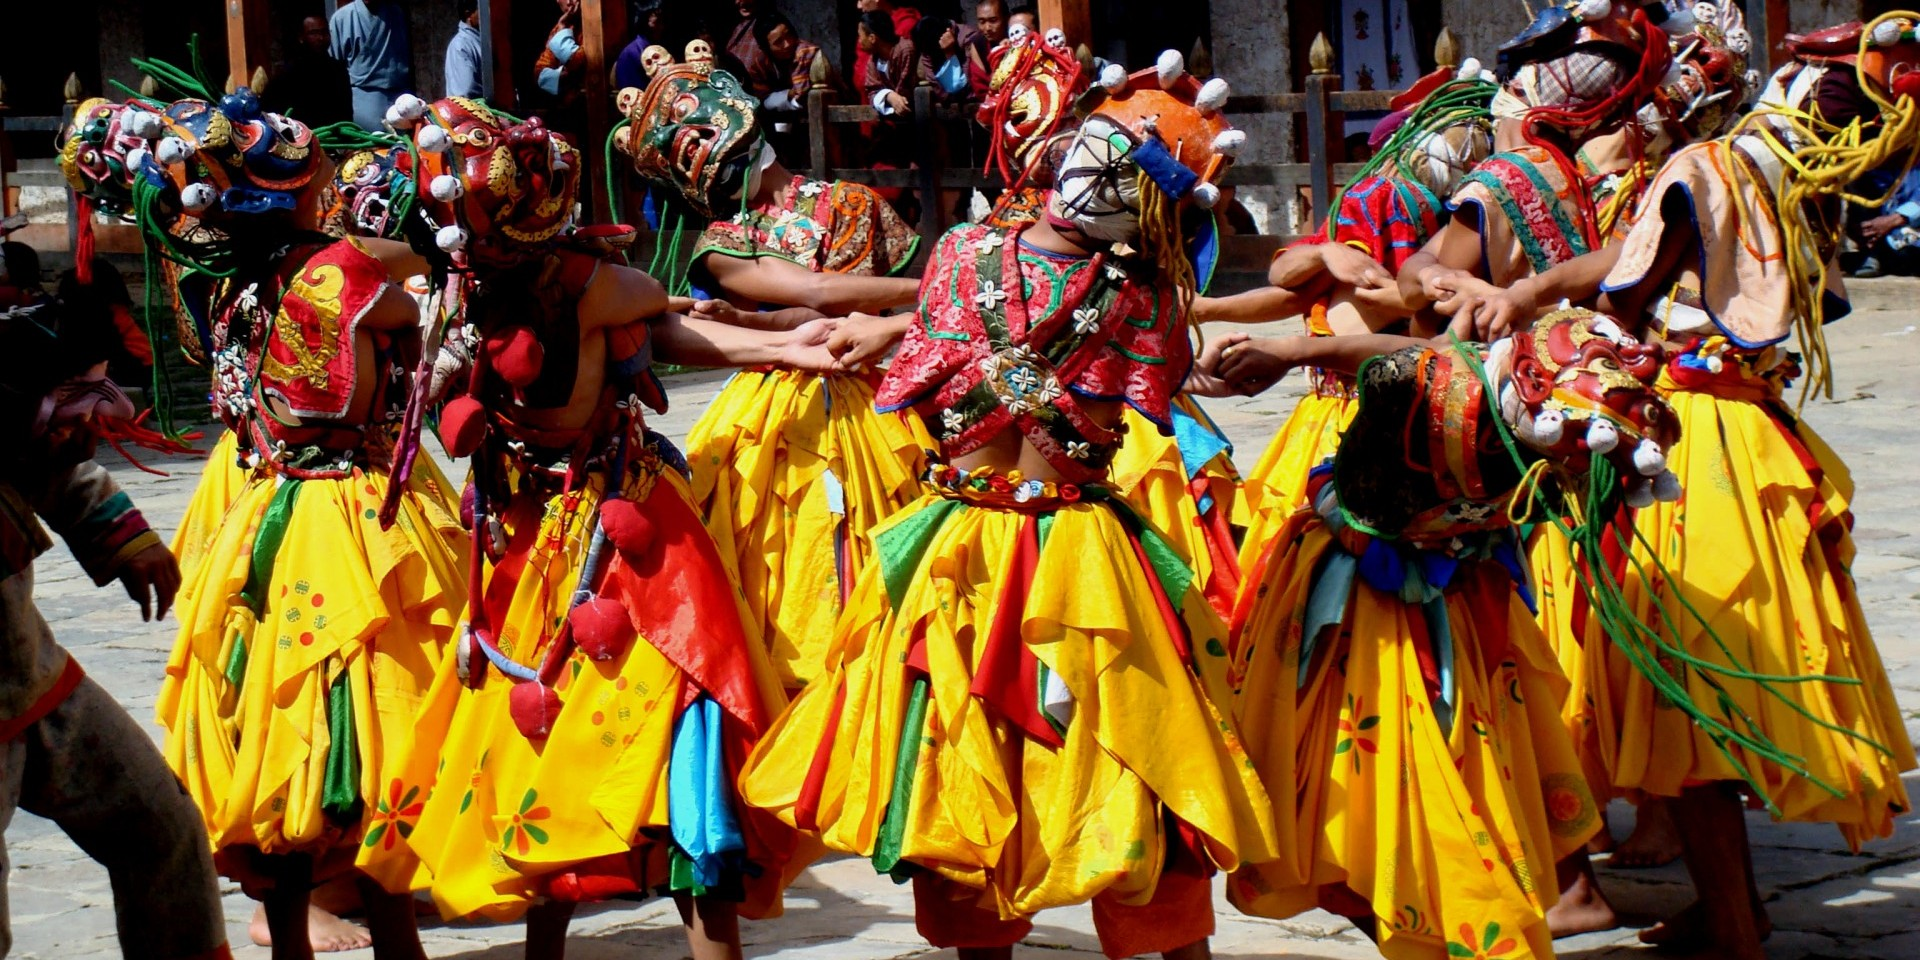 nimalung-festival-3072-2304